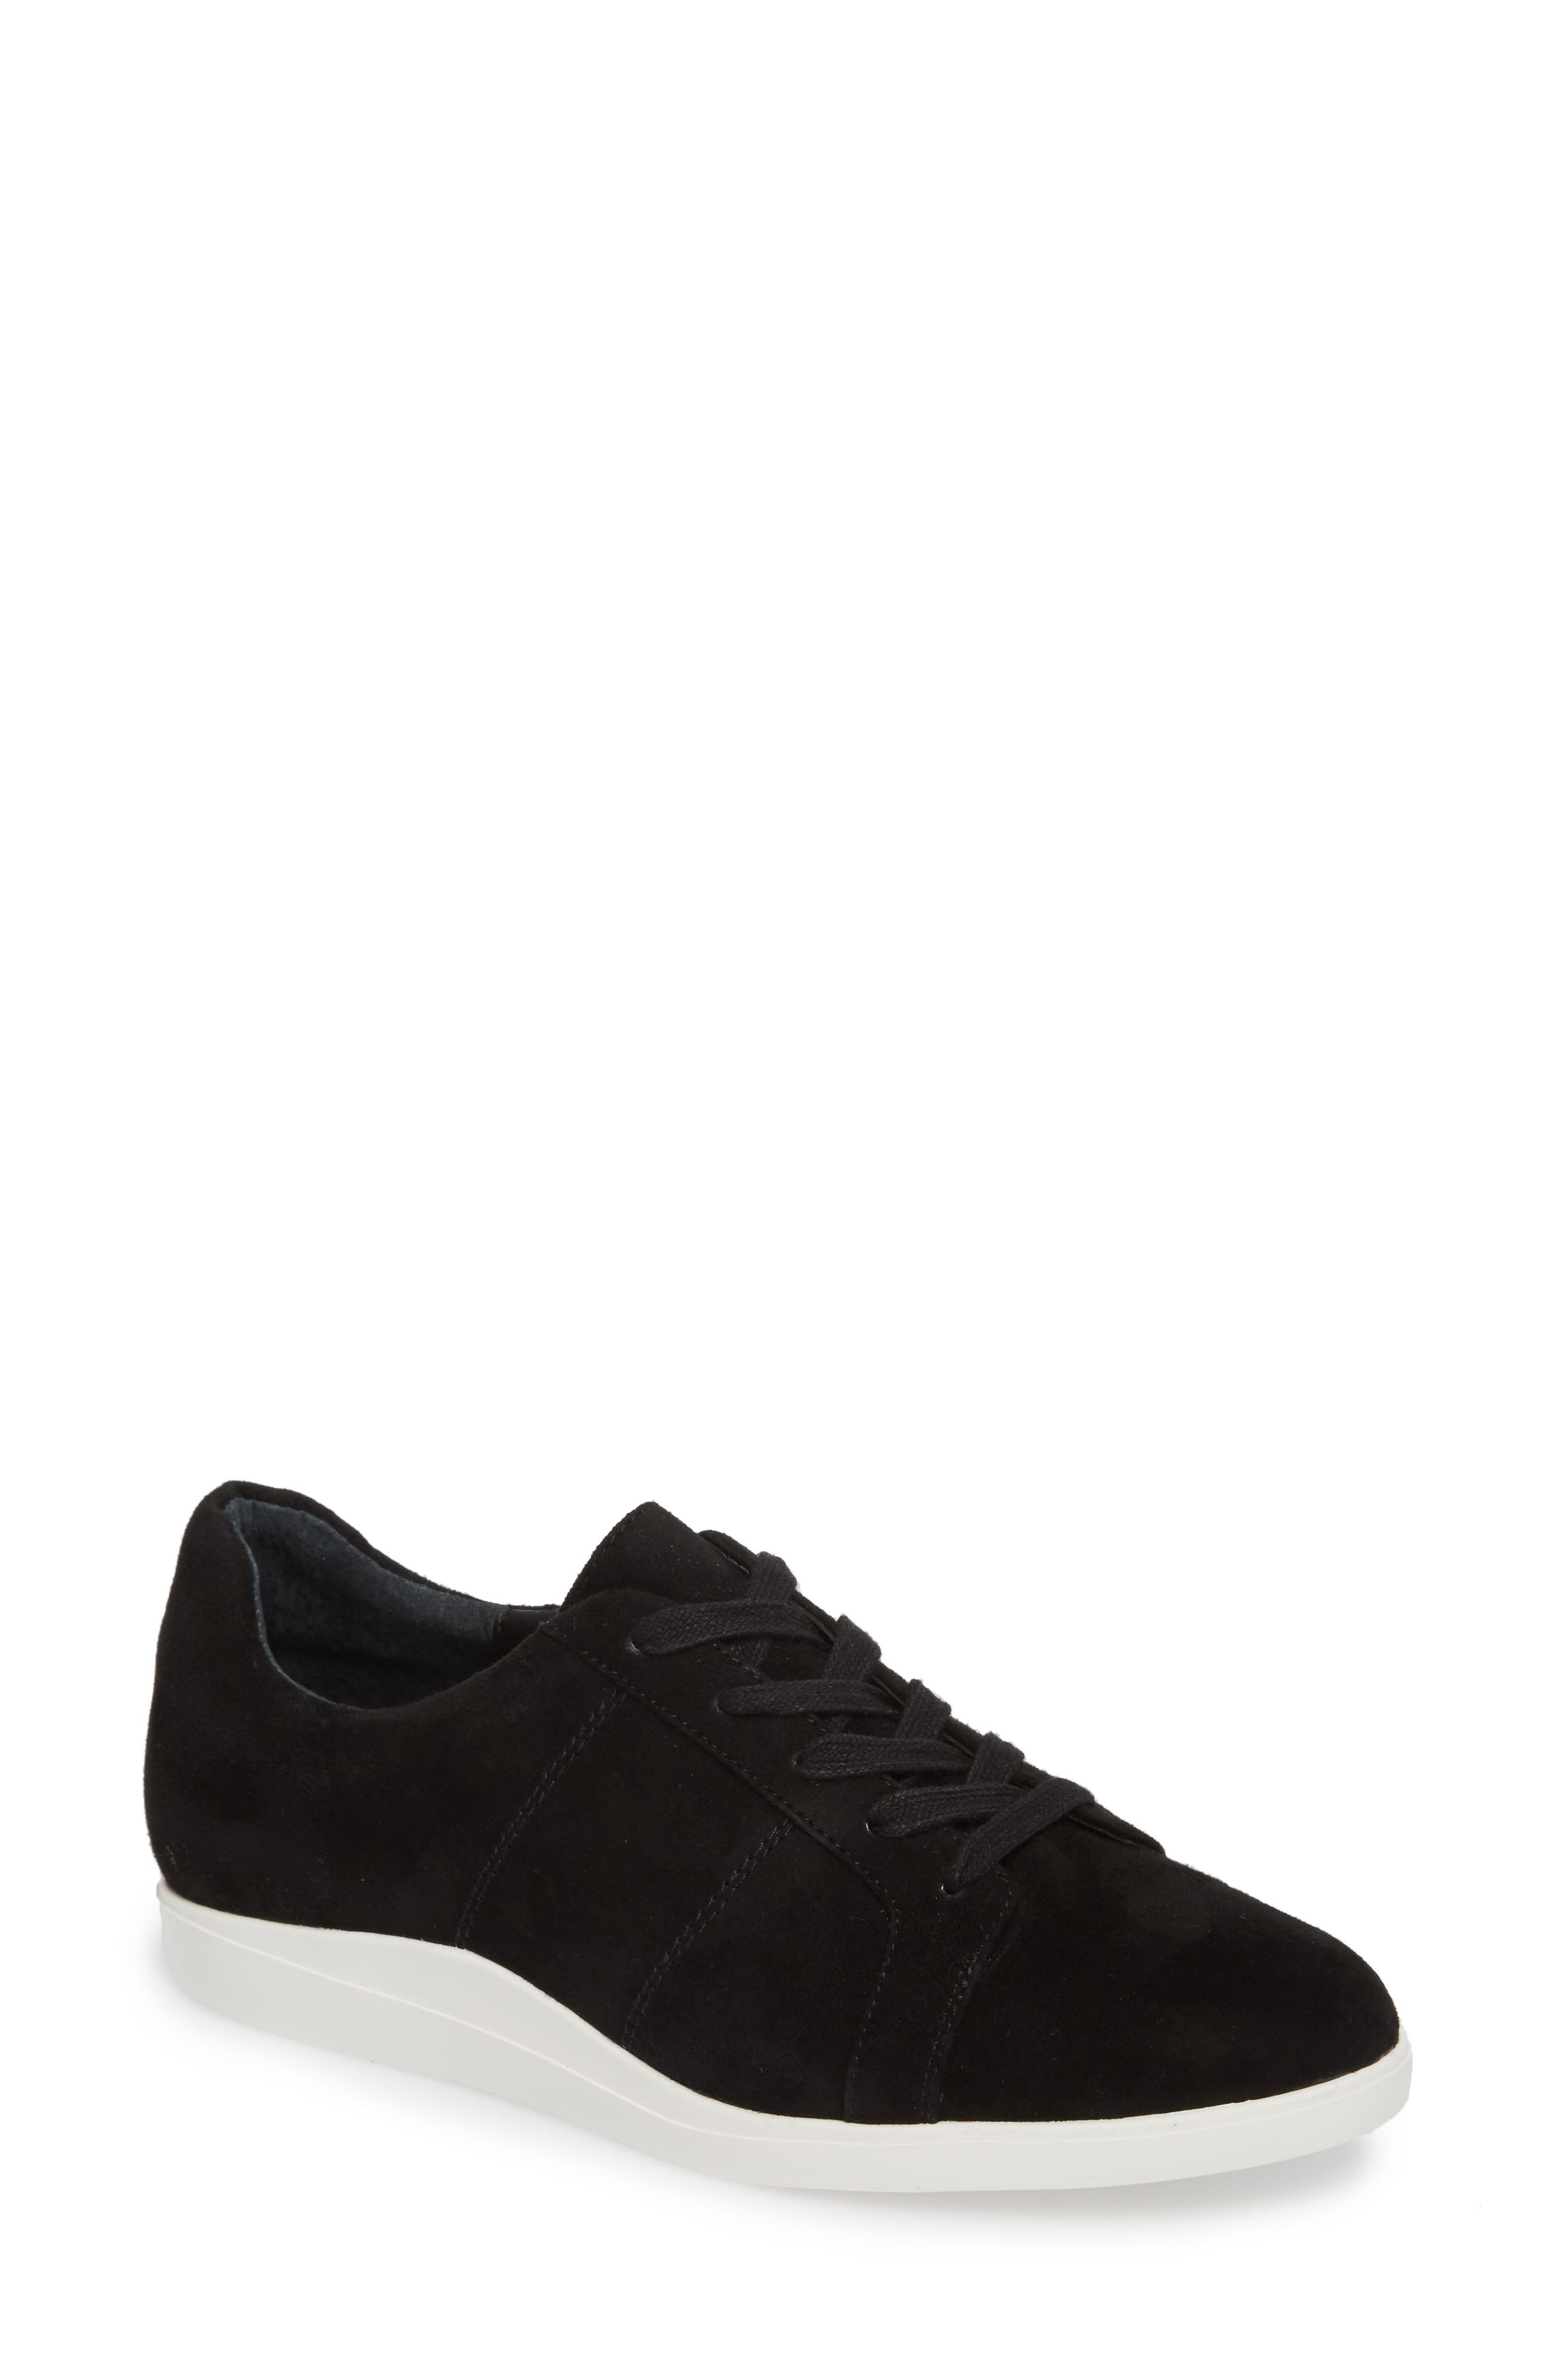 Sharleen Sneaker,                         Main,                         color, 001